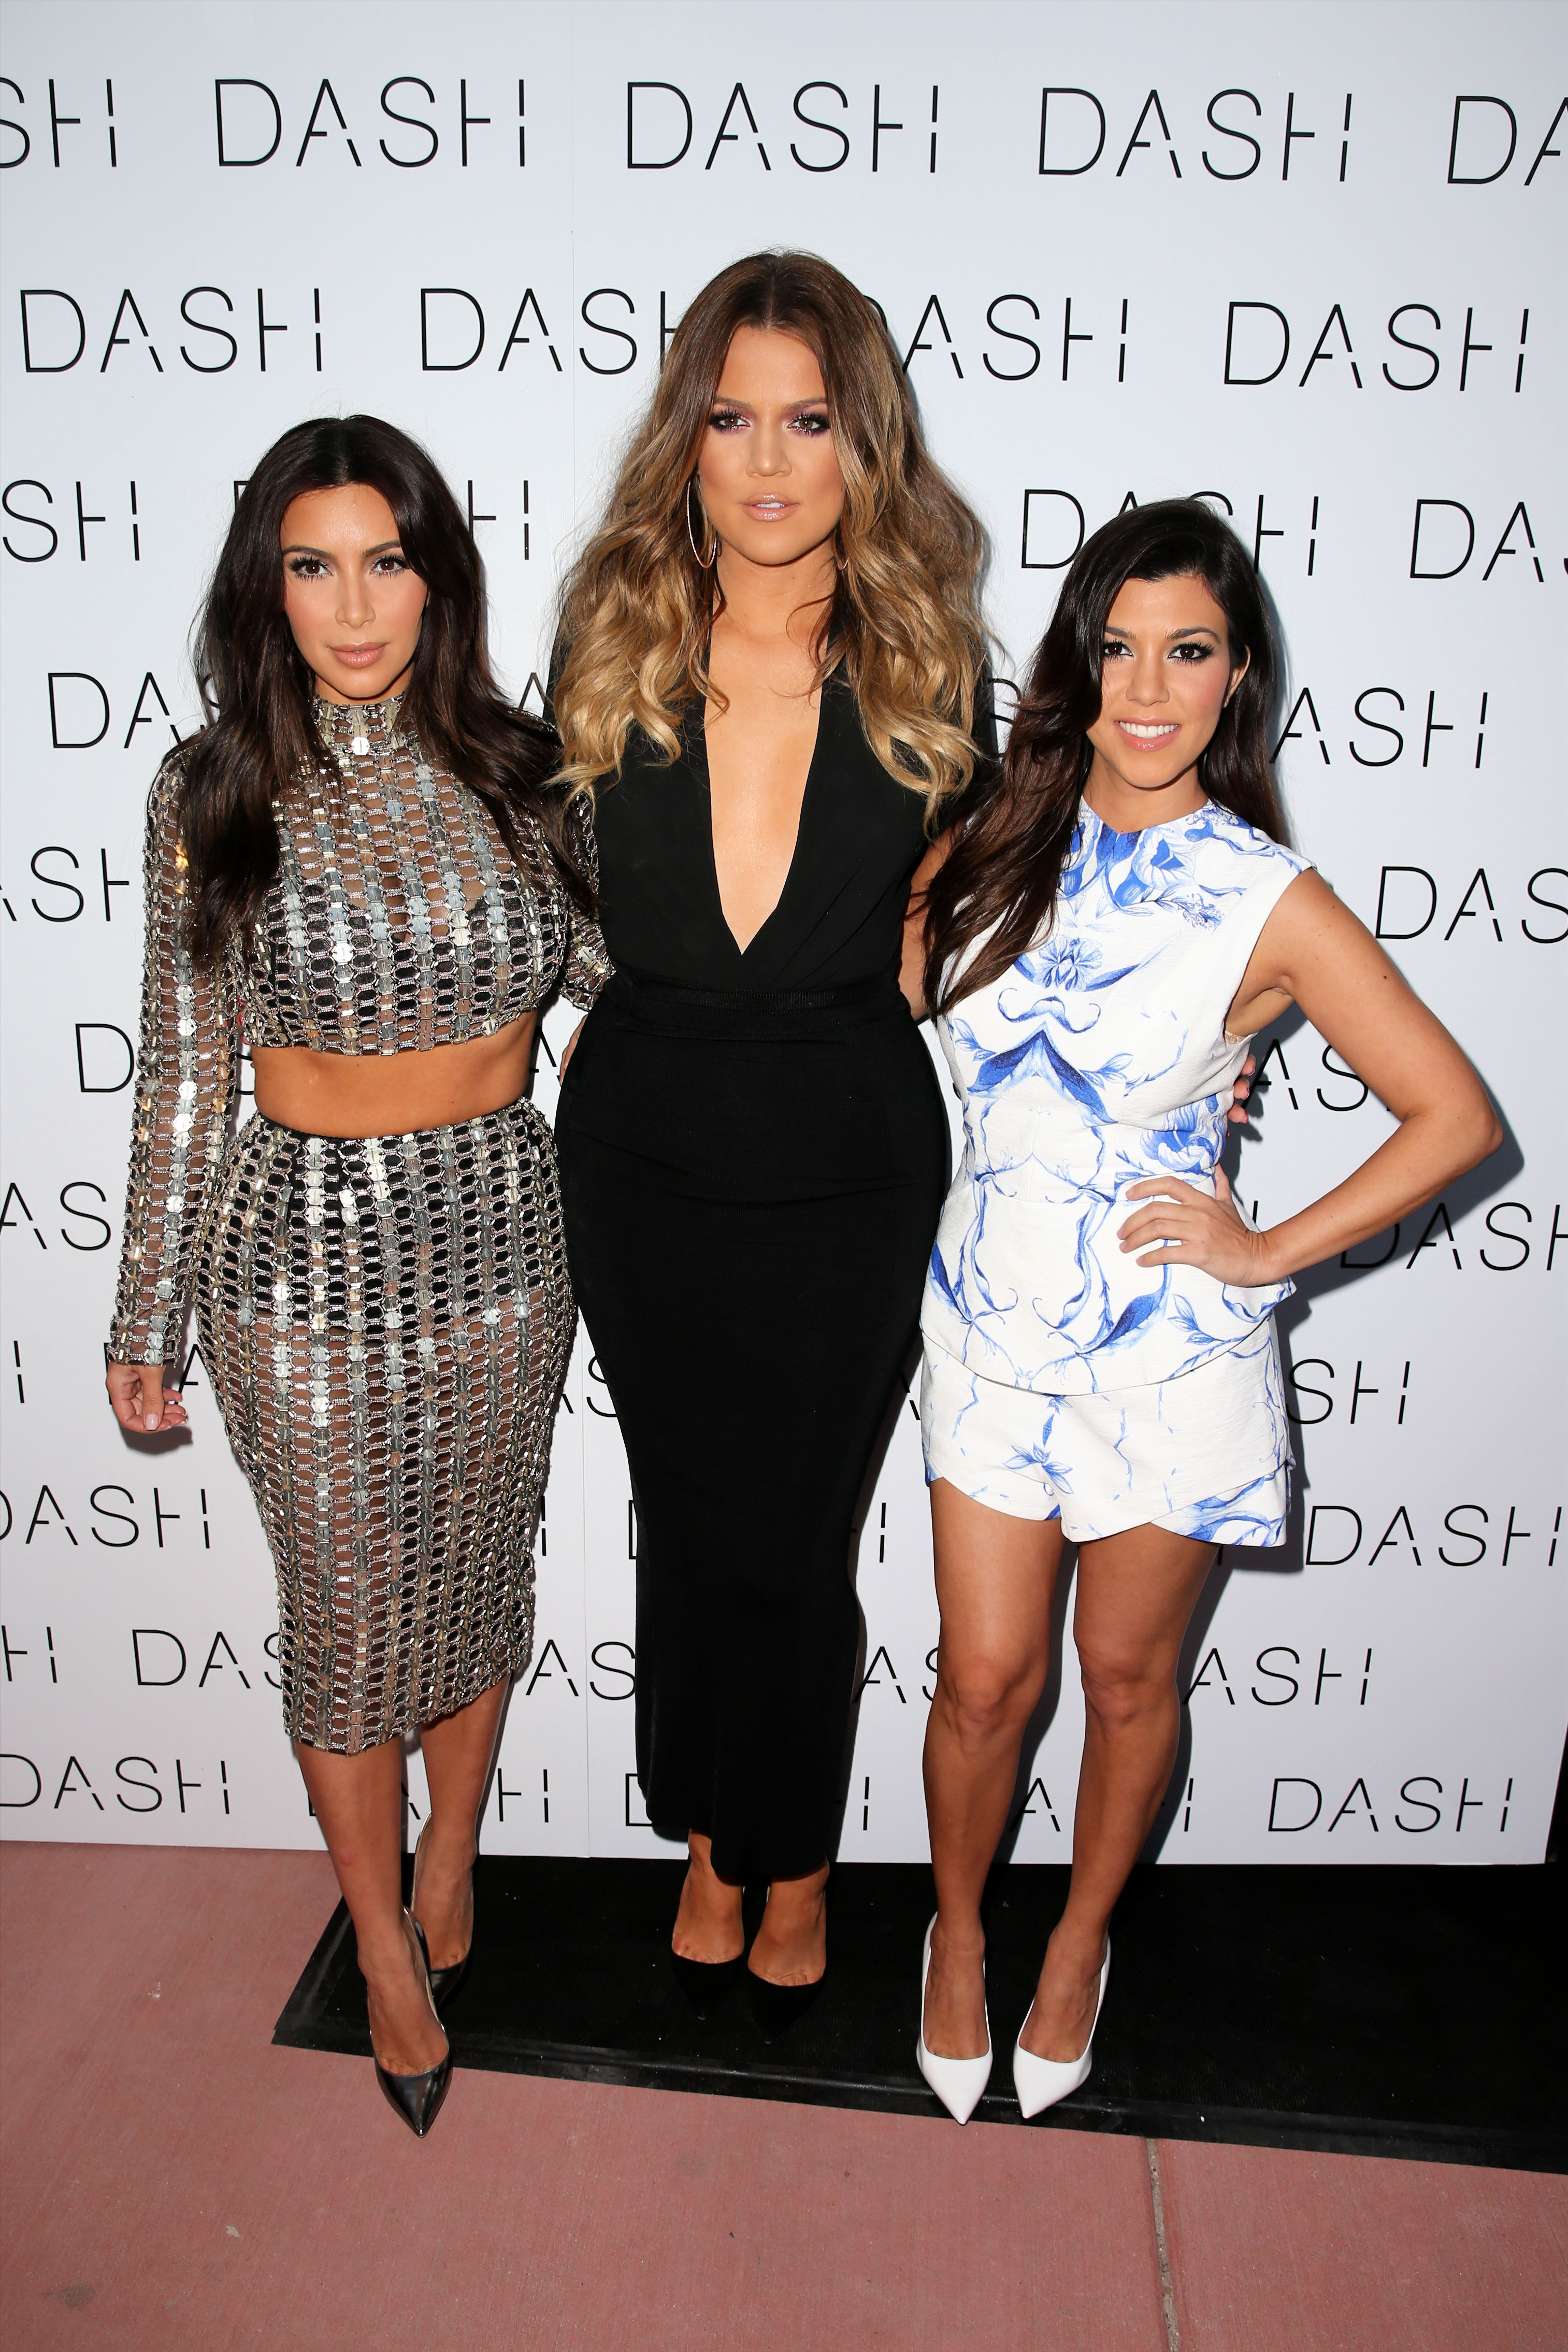 Kim Kardashian - We're Closing Our Dash Stores!